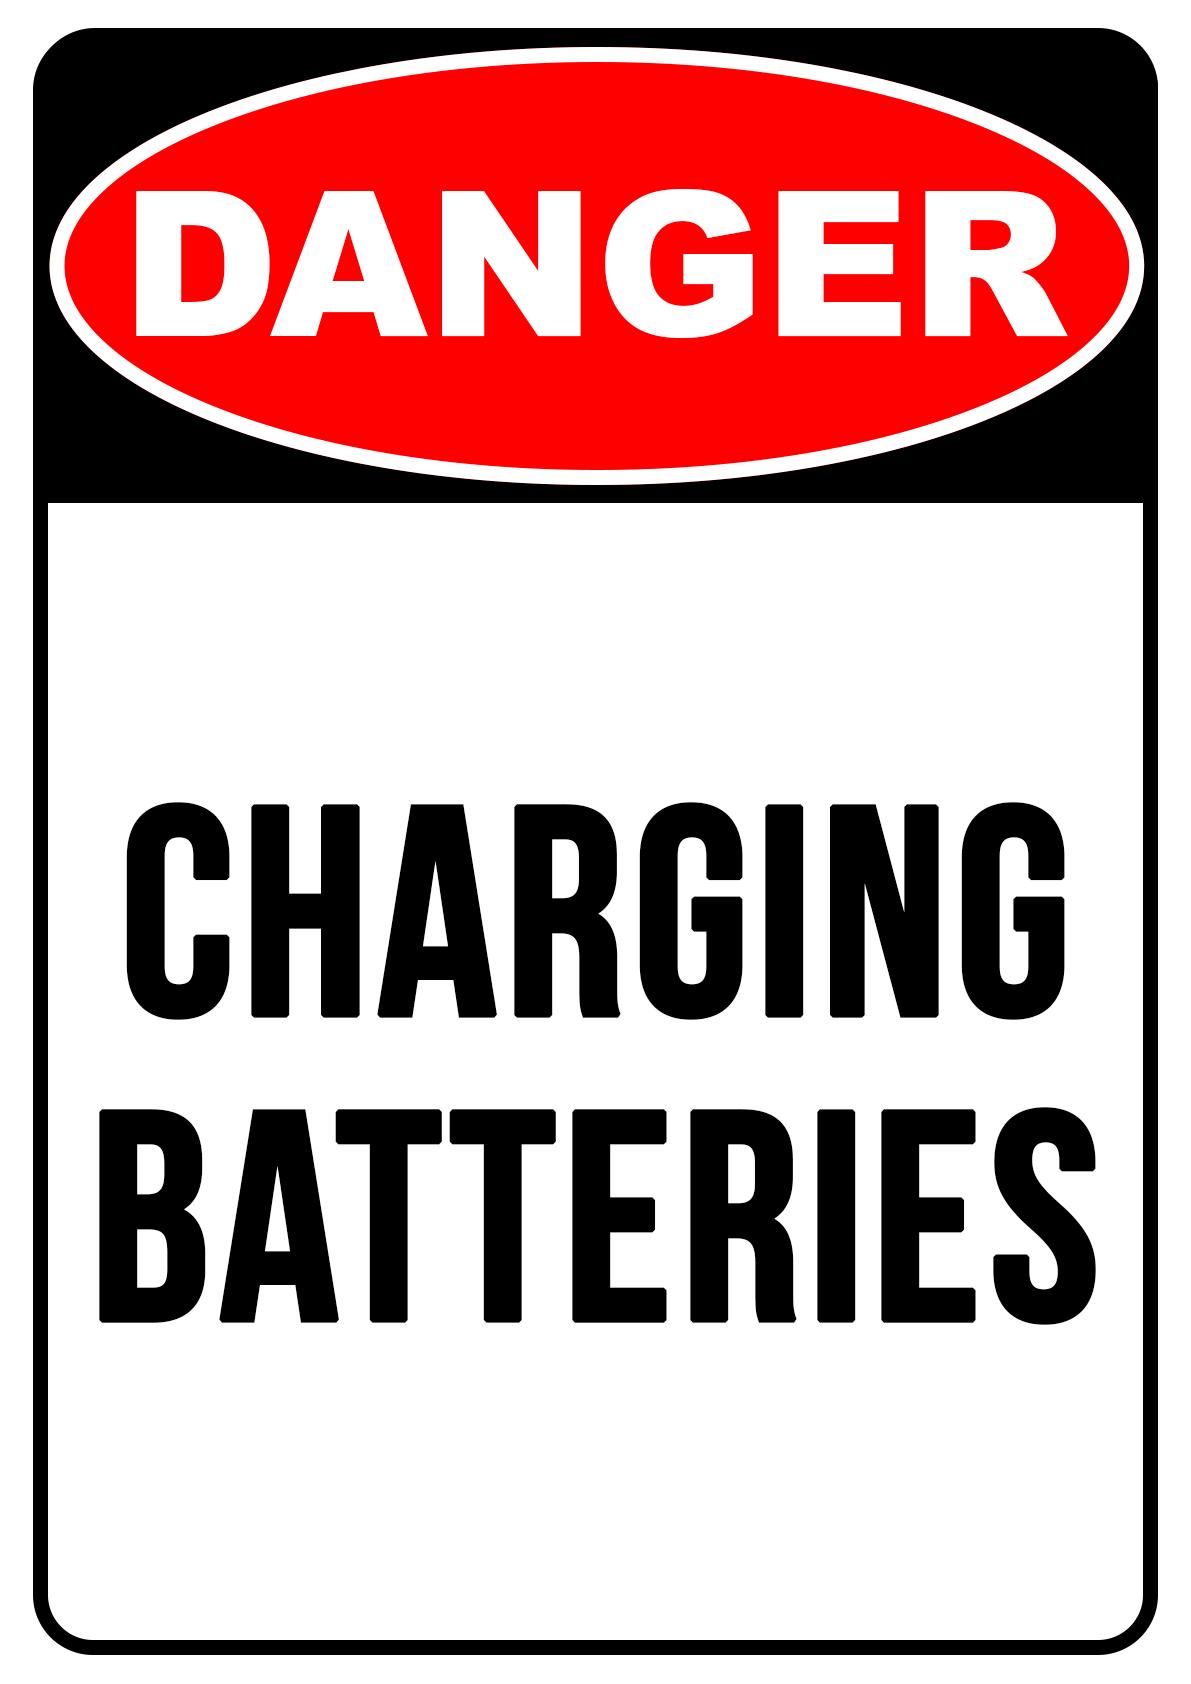 Danger Charging Batteries - Safety Sign Australia